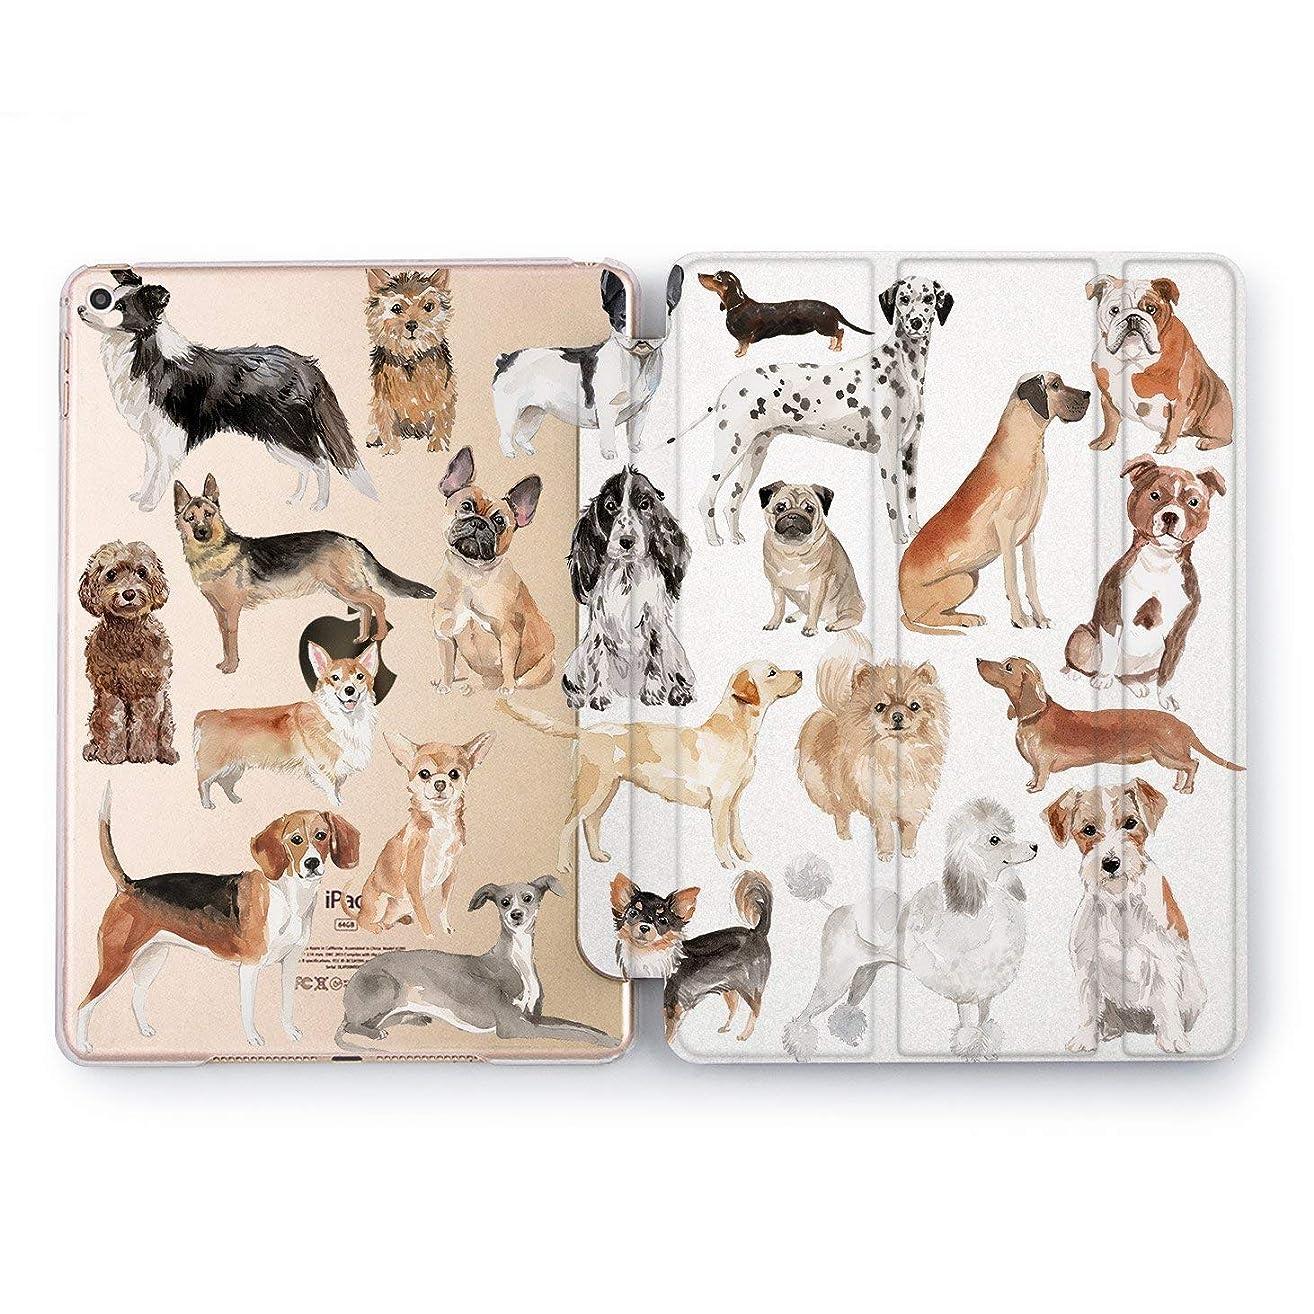 Wonder Wild Dog Pattern Apple iPad Pro Case 9.7 11 inch Mini 1 2 3 4 Air 2 10.5 12.9 2018 2017 Design 5th 6th Gen Clear Smart Hard Cover Animal Dogs Pets Boxer Labrador Retriever Man Best Friend